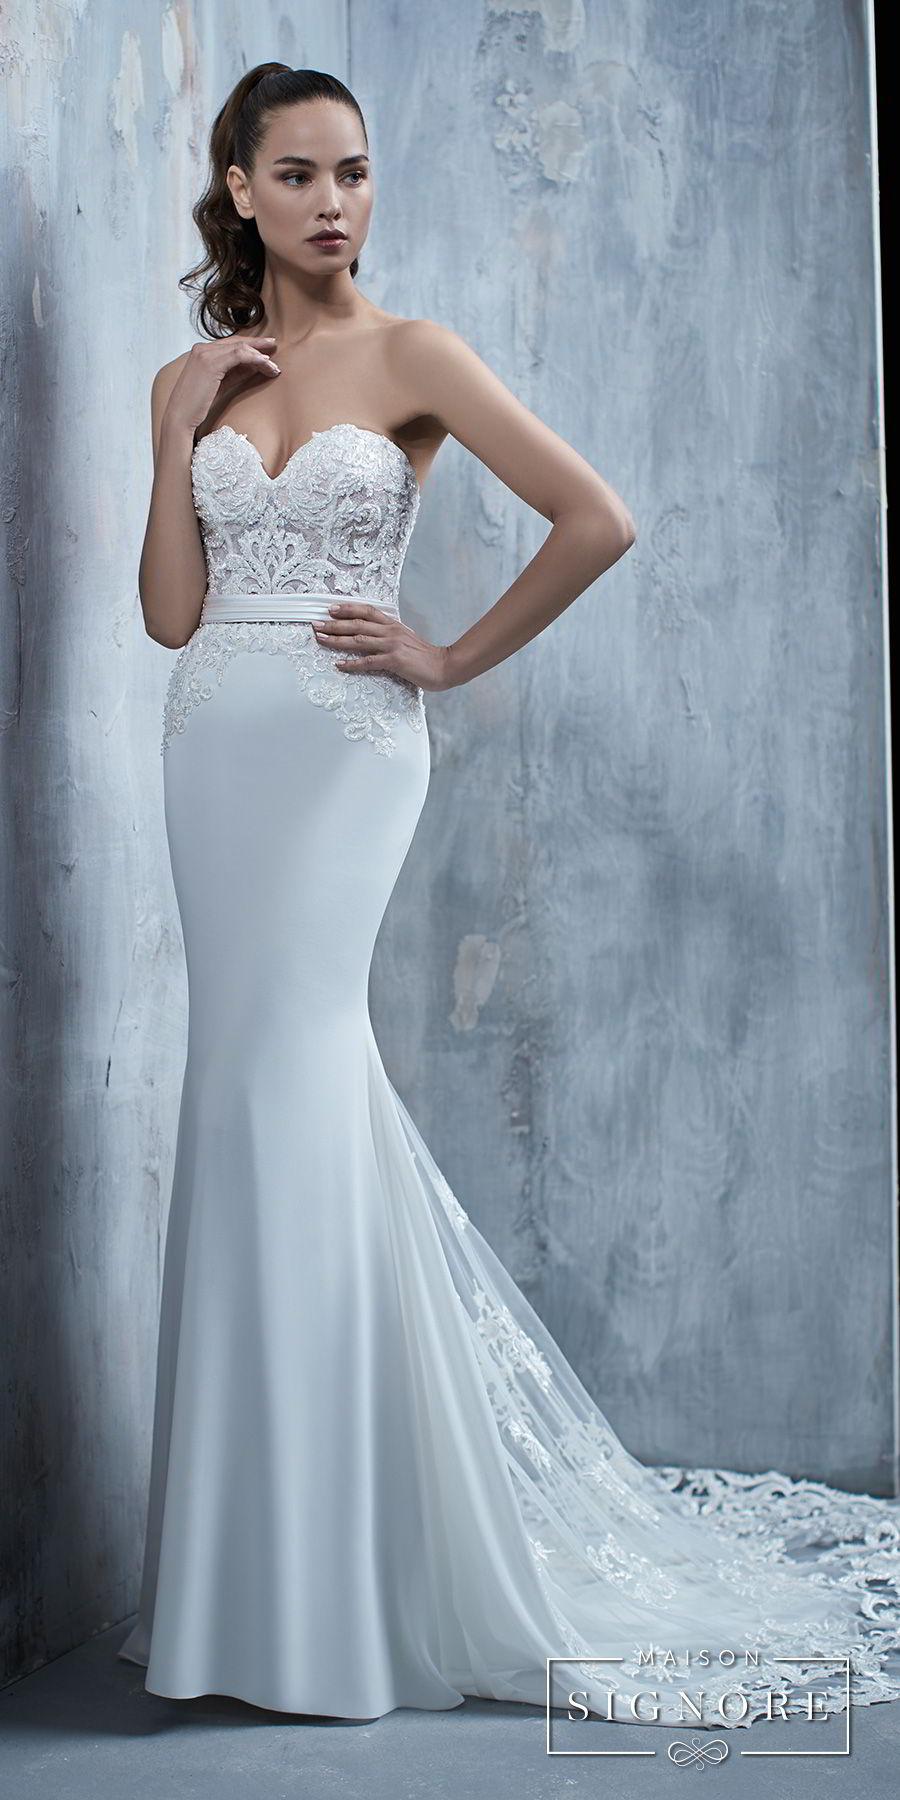 maison signore 2017 bridal strapless sweetheart neckline heavily embellished bodice elegant fit and flare sheath wedding dress chapel train (tullia) mv